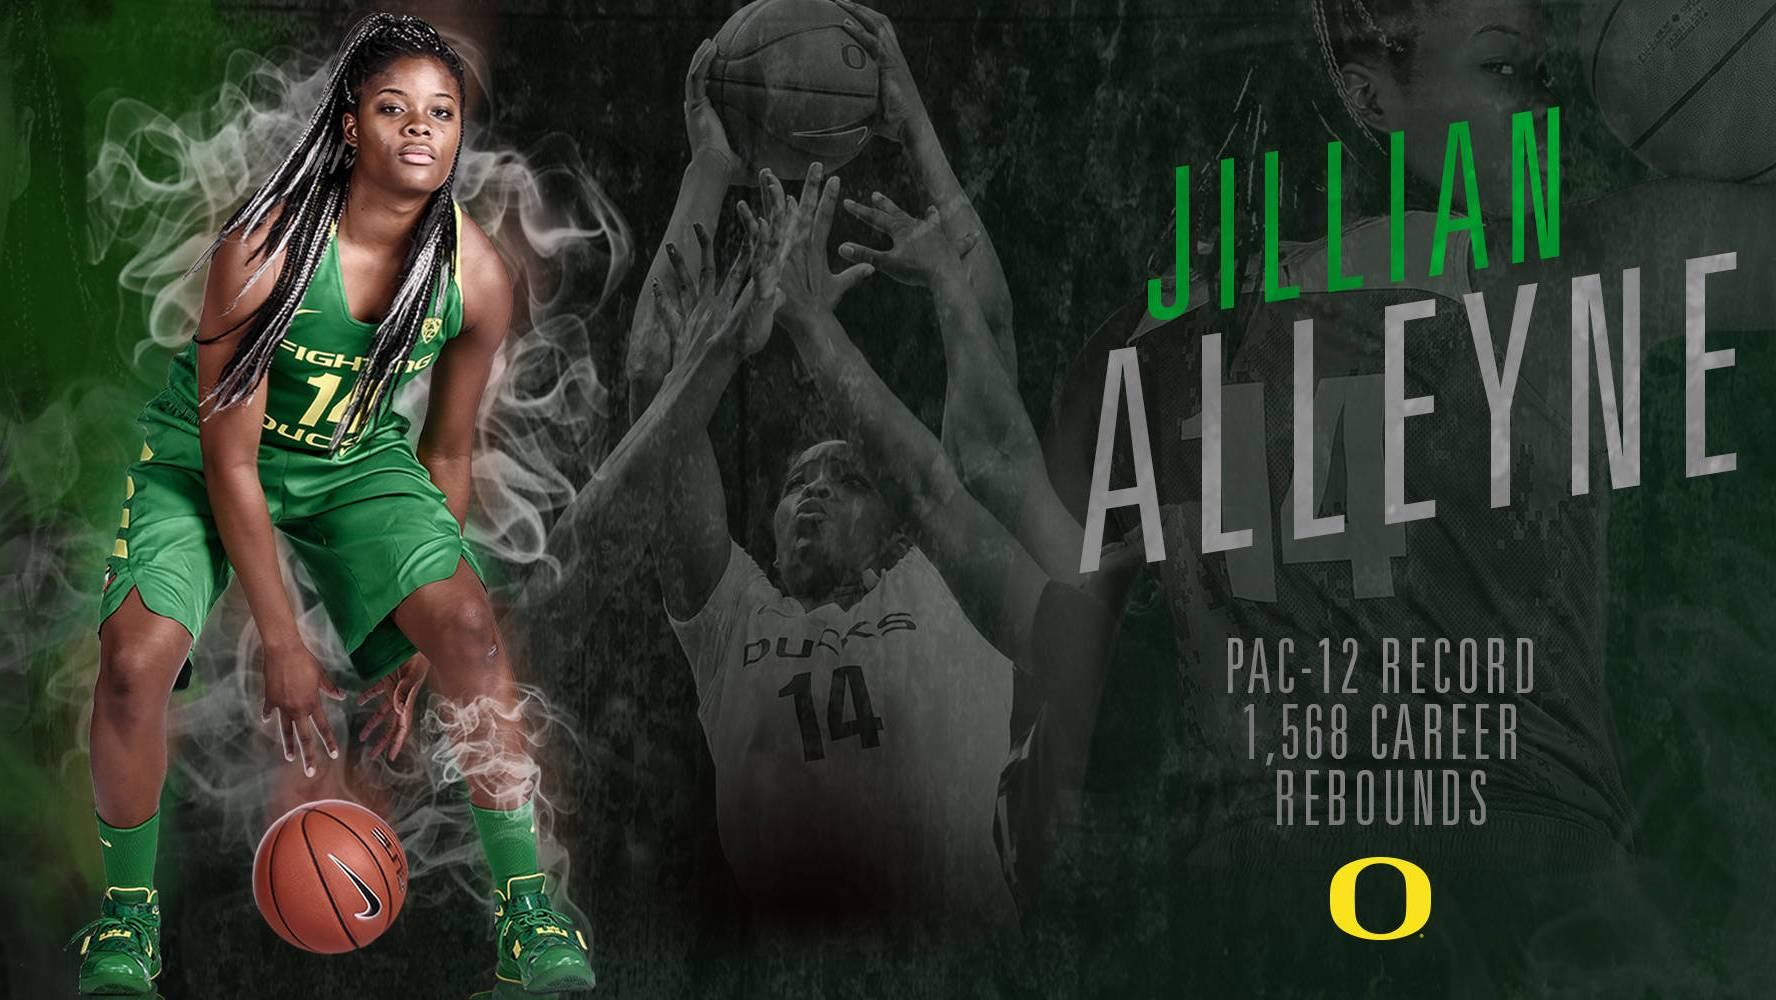 Oregon's Jillian Alleyne becomes Pac-12 all-time rebounding leader